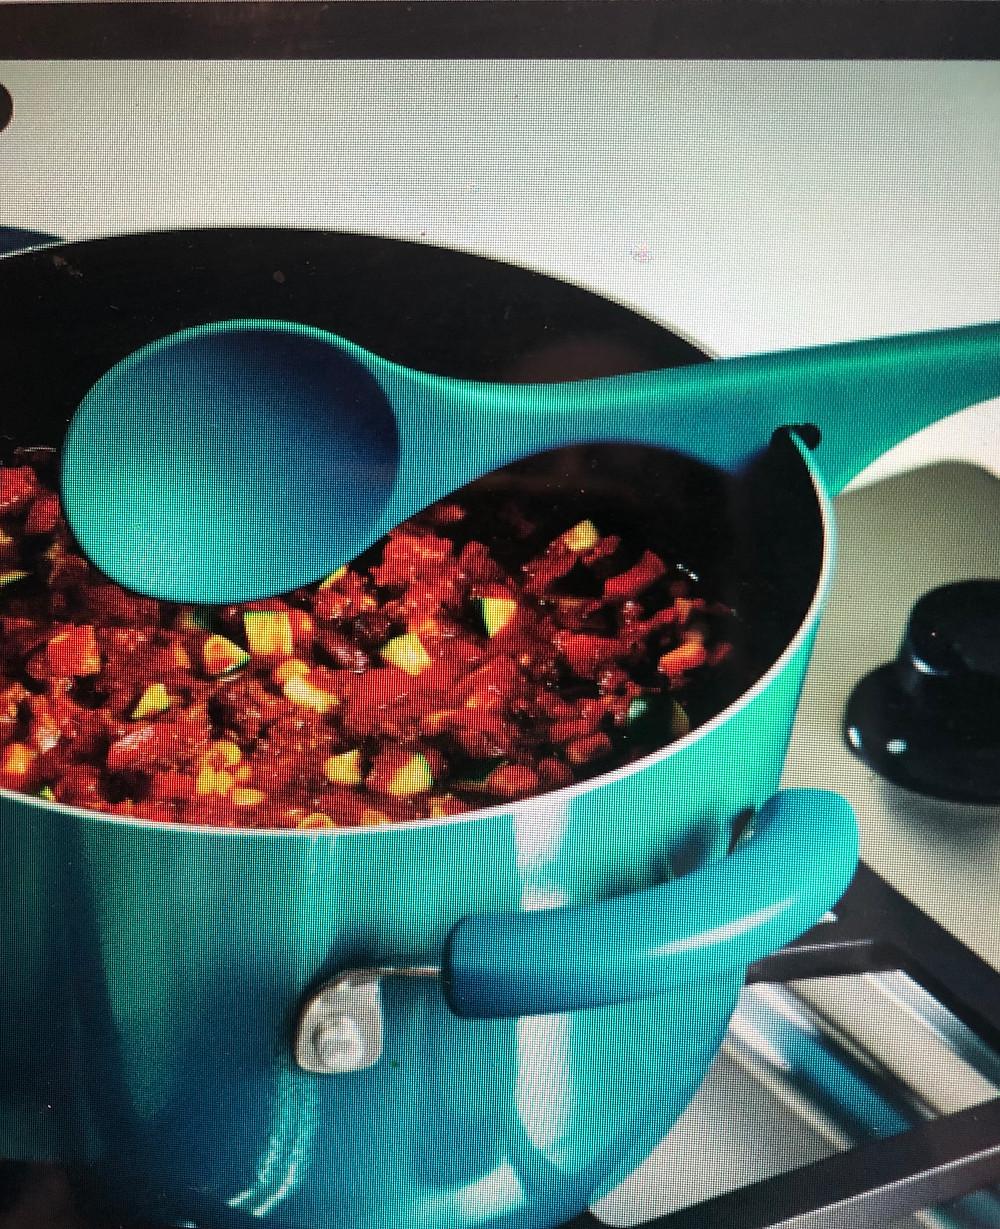 Rachel Ray Spoon that cradles the pot.